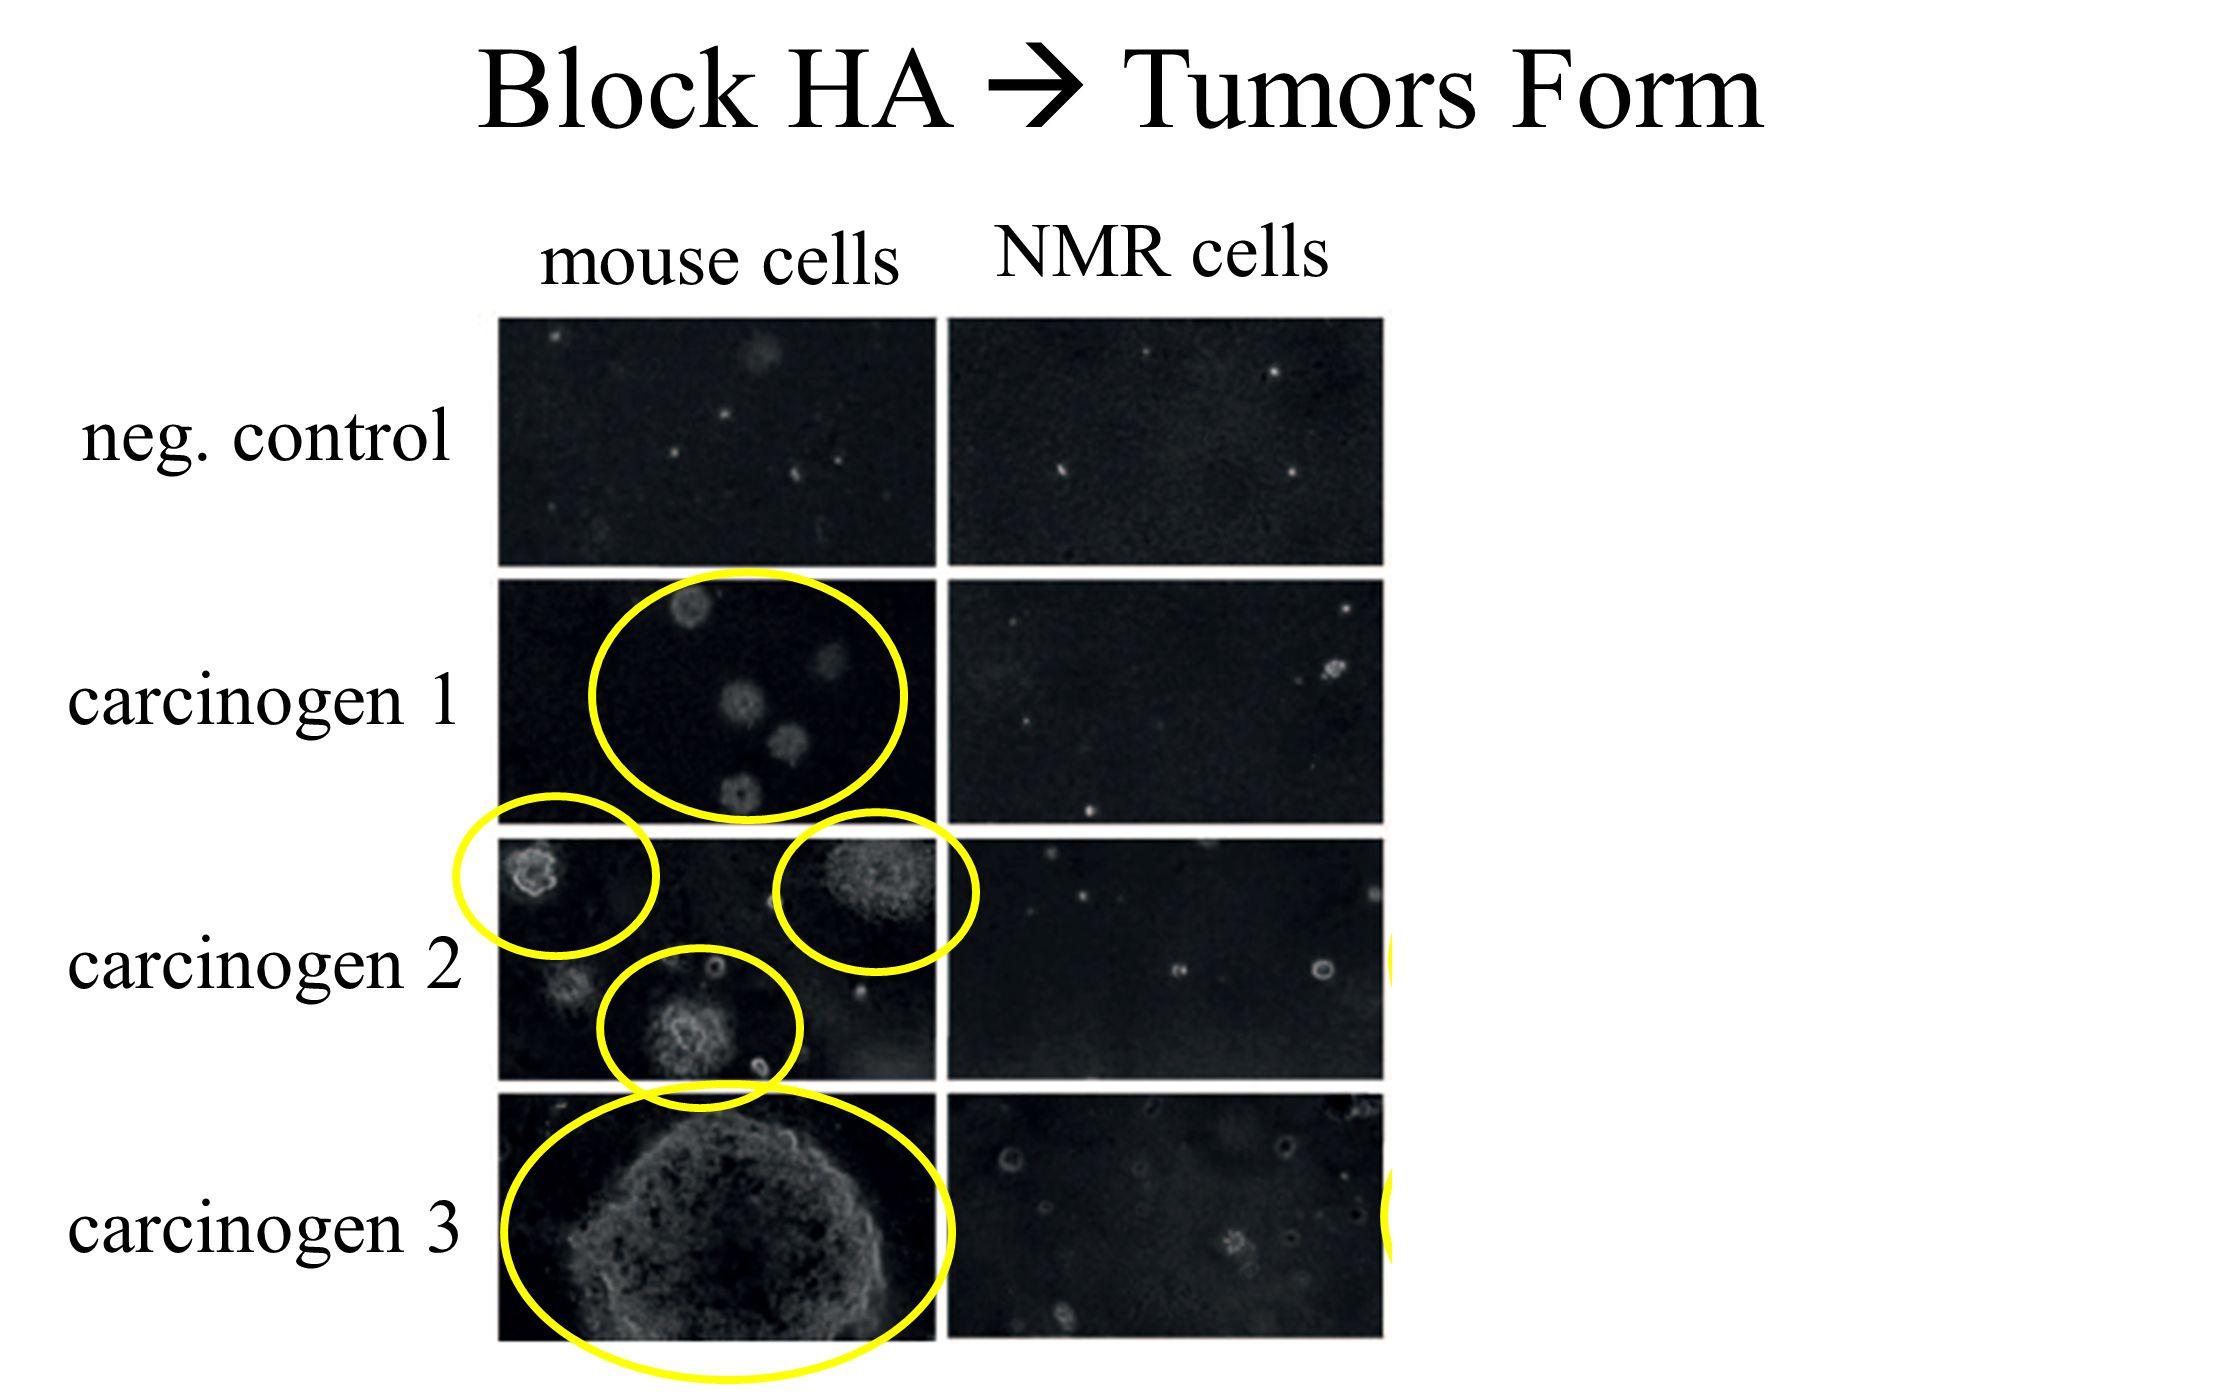 neg. control carcinogen 1 carcinogen 2 carcinogen 3 NMR NMR - HAmouse cells Block HA  Tumors Form